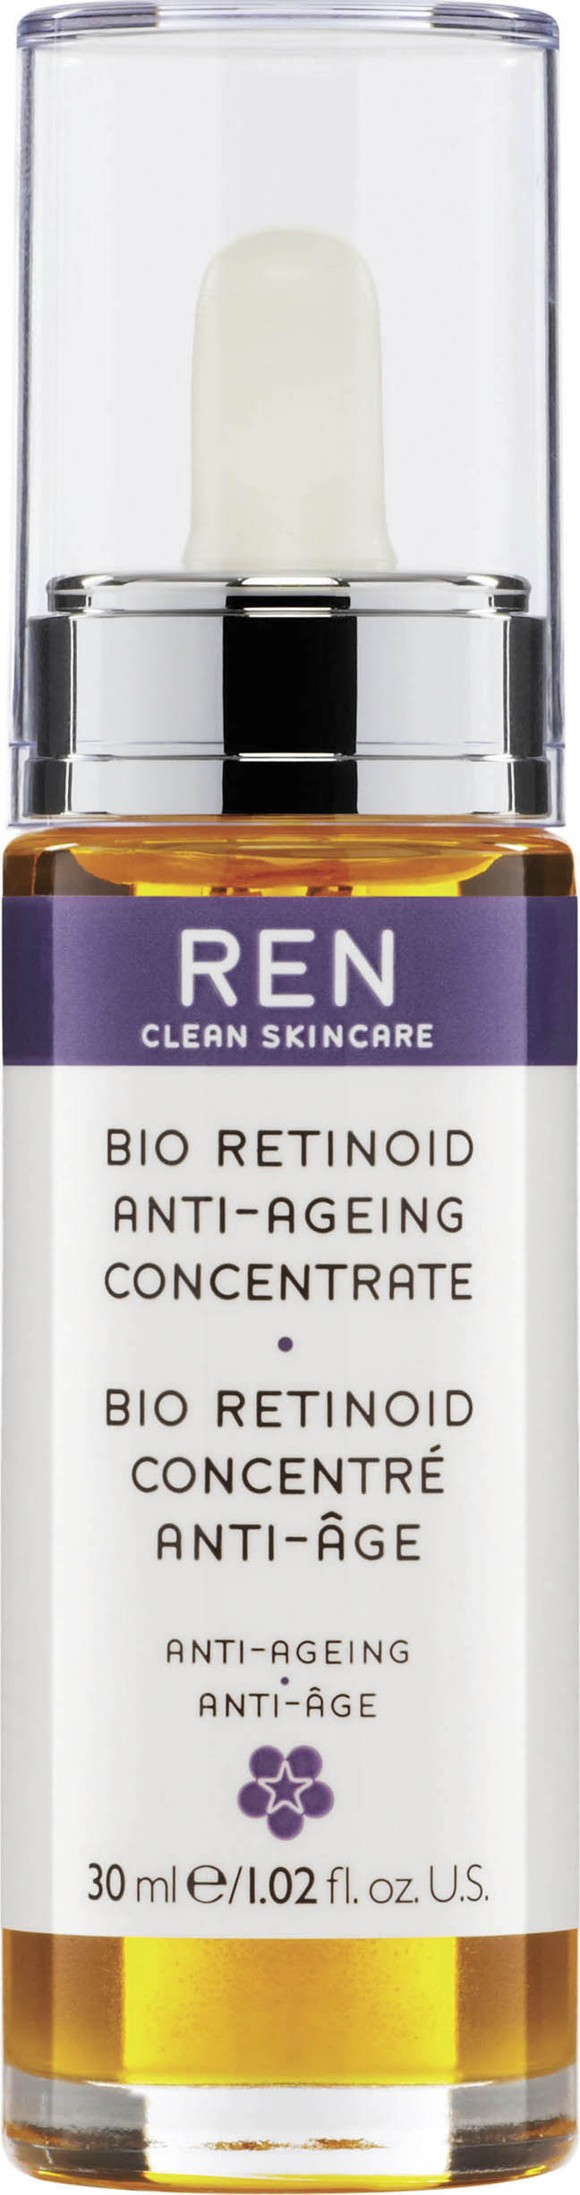 REN - Bio Retinoid Anti-Wrinkle Concentrate Ansigtsoile 30 ml